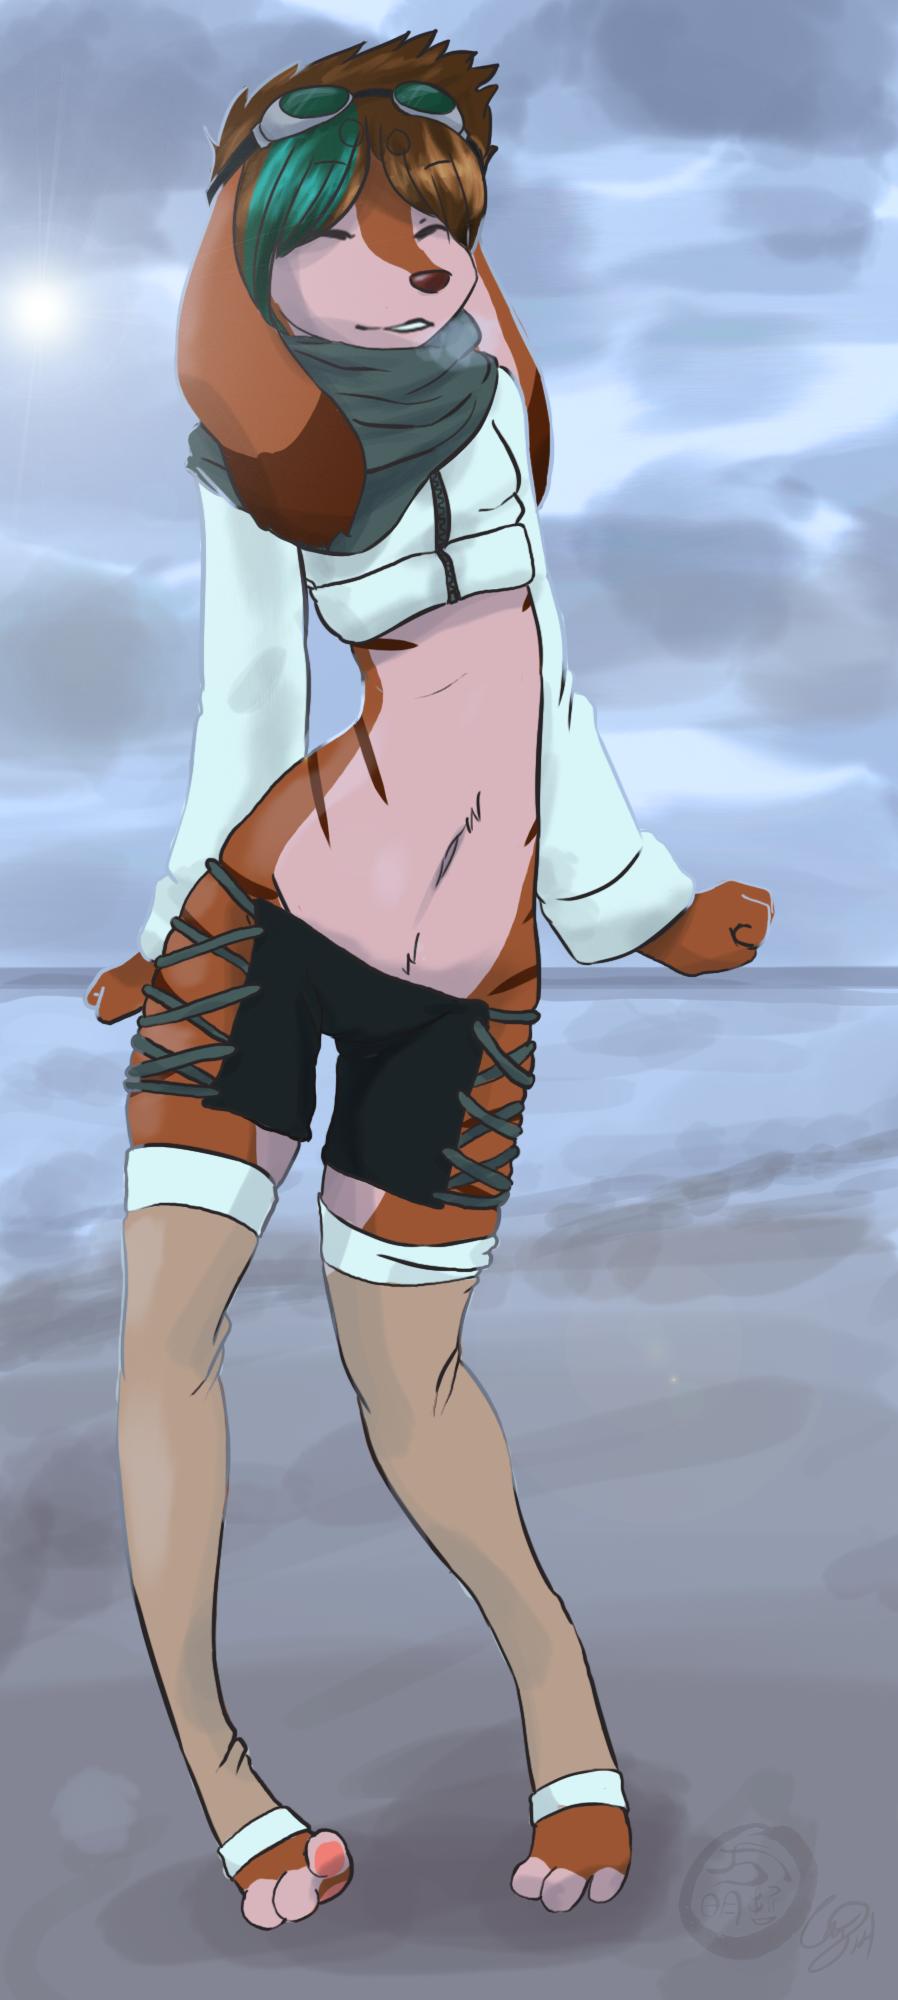 Chilly Bun